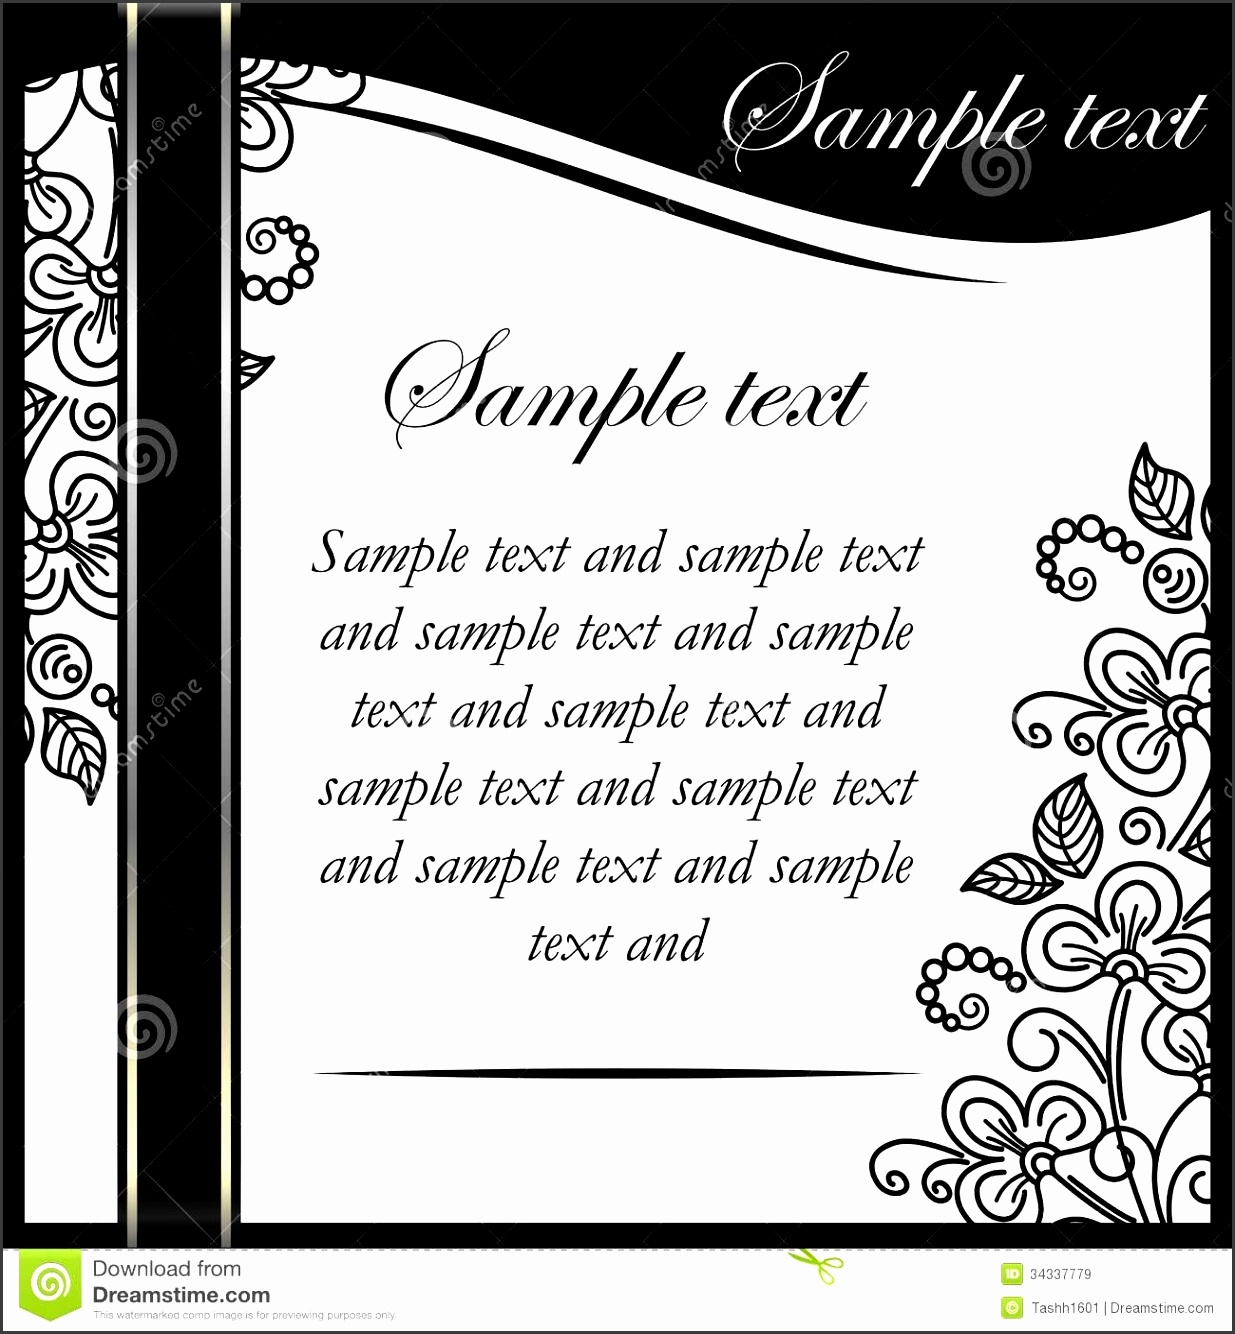 25 Blank Black And White Wedding Invitation Templates